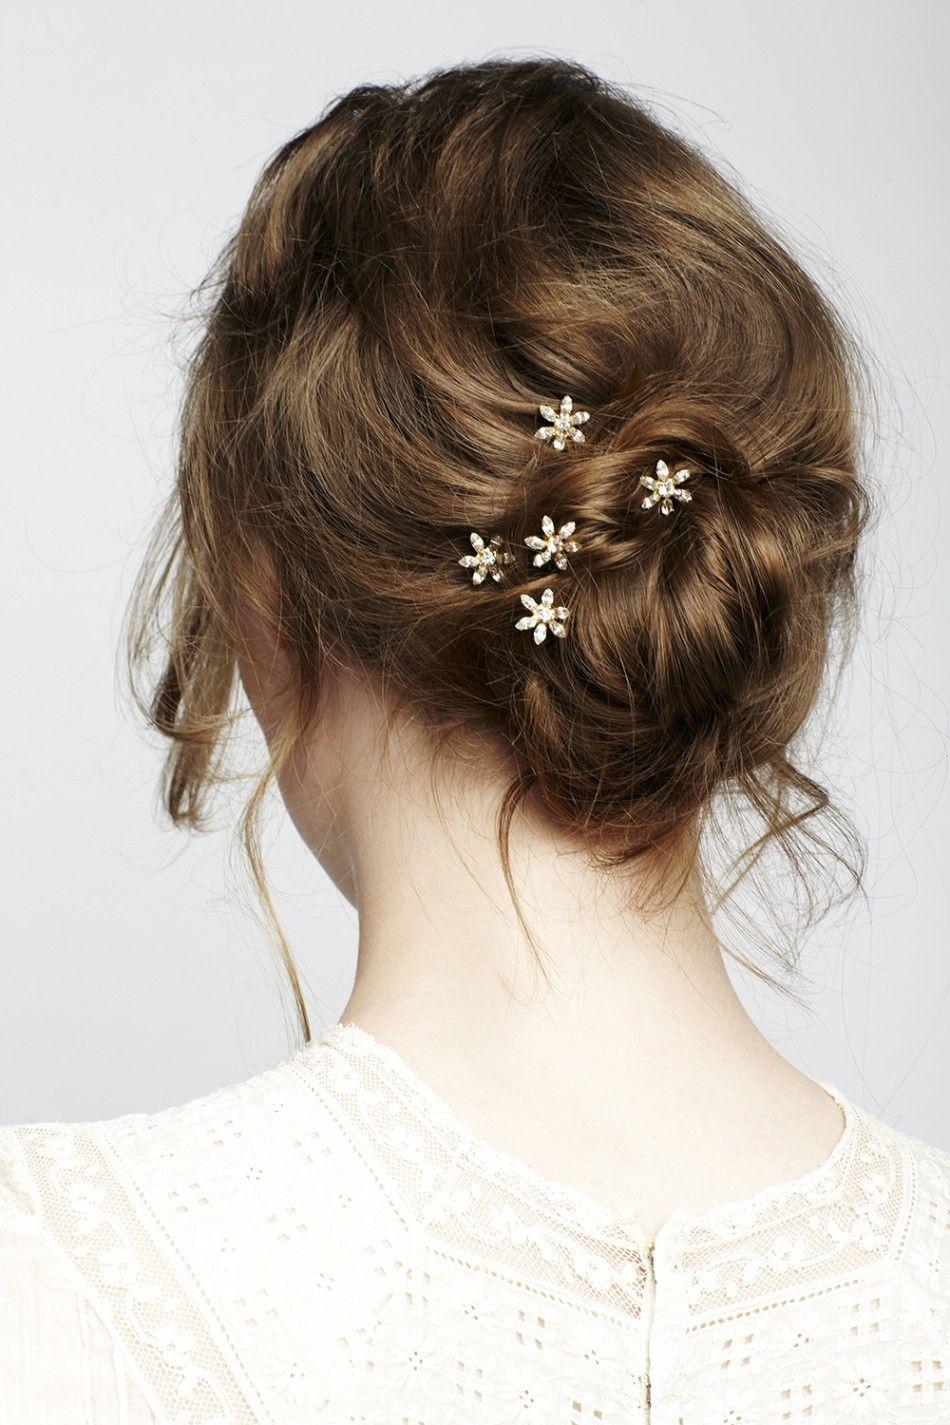 jennifer behr hair accessories | one day bridal | now